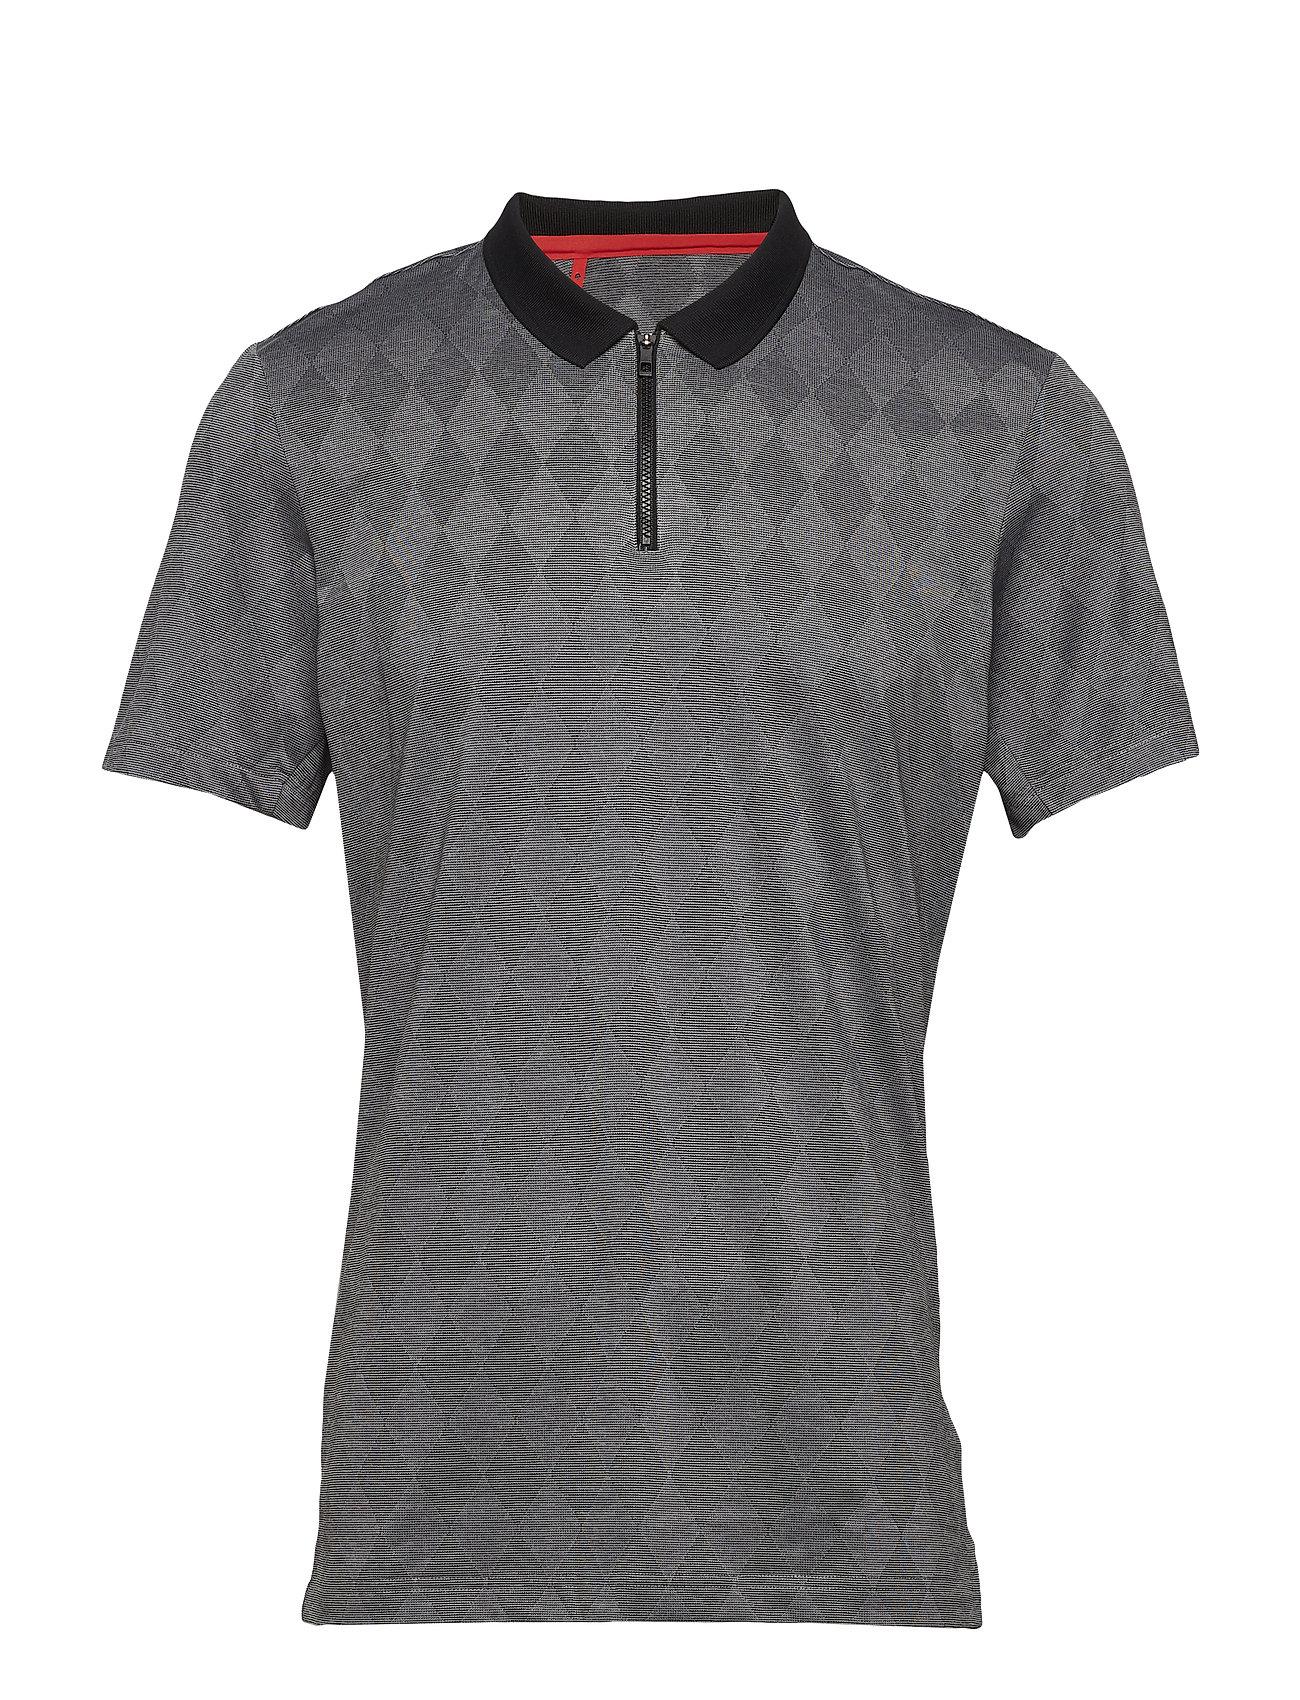 44936958 Barricade Polo (Black) (£35.97) - adidas Tennis - | Boozt.com